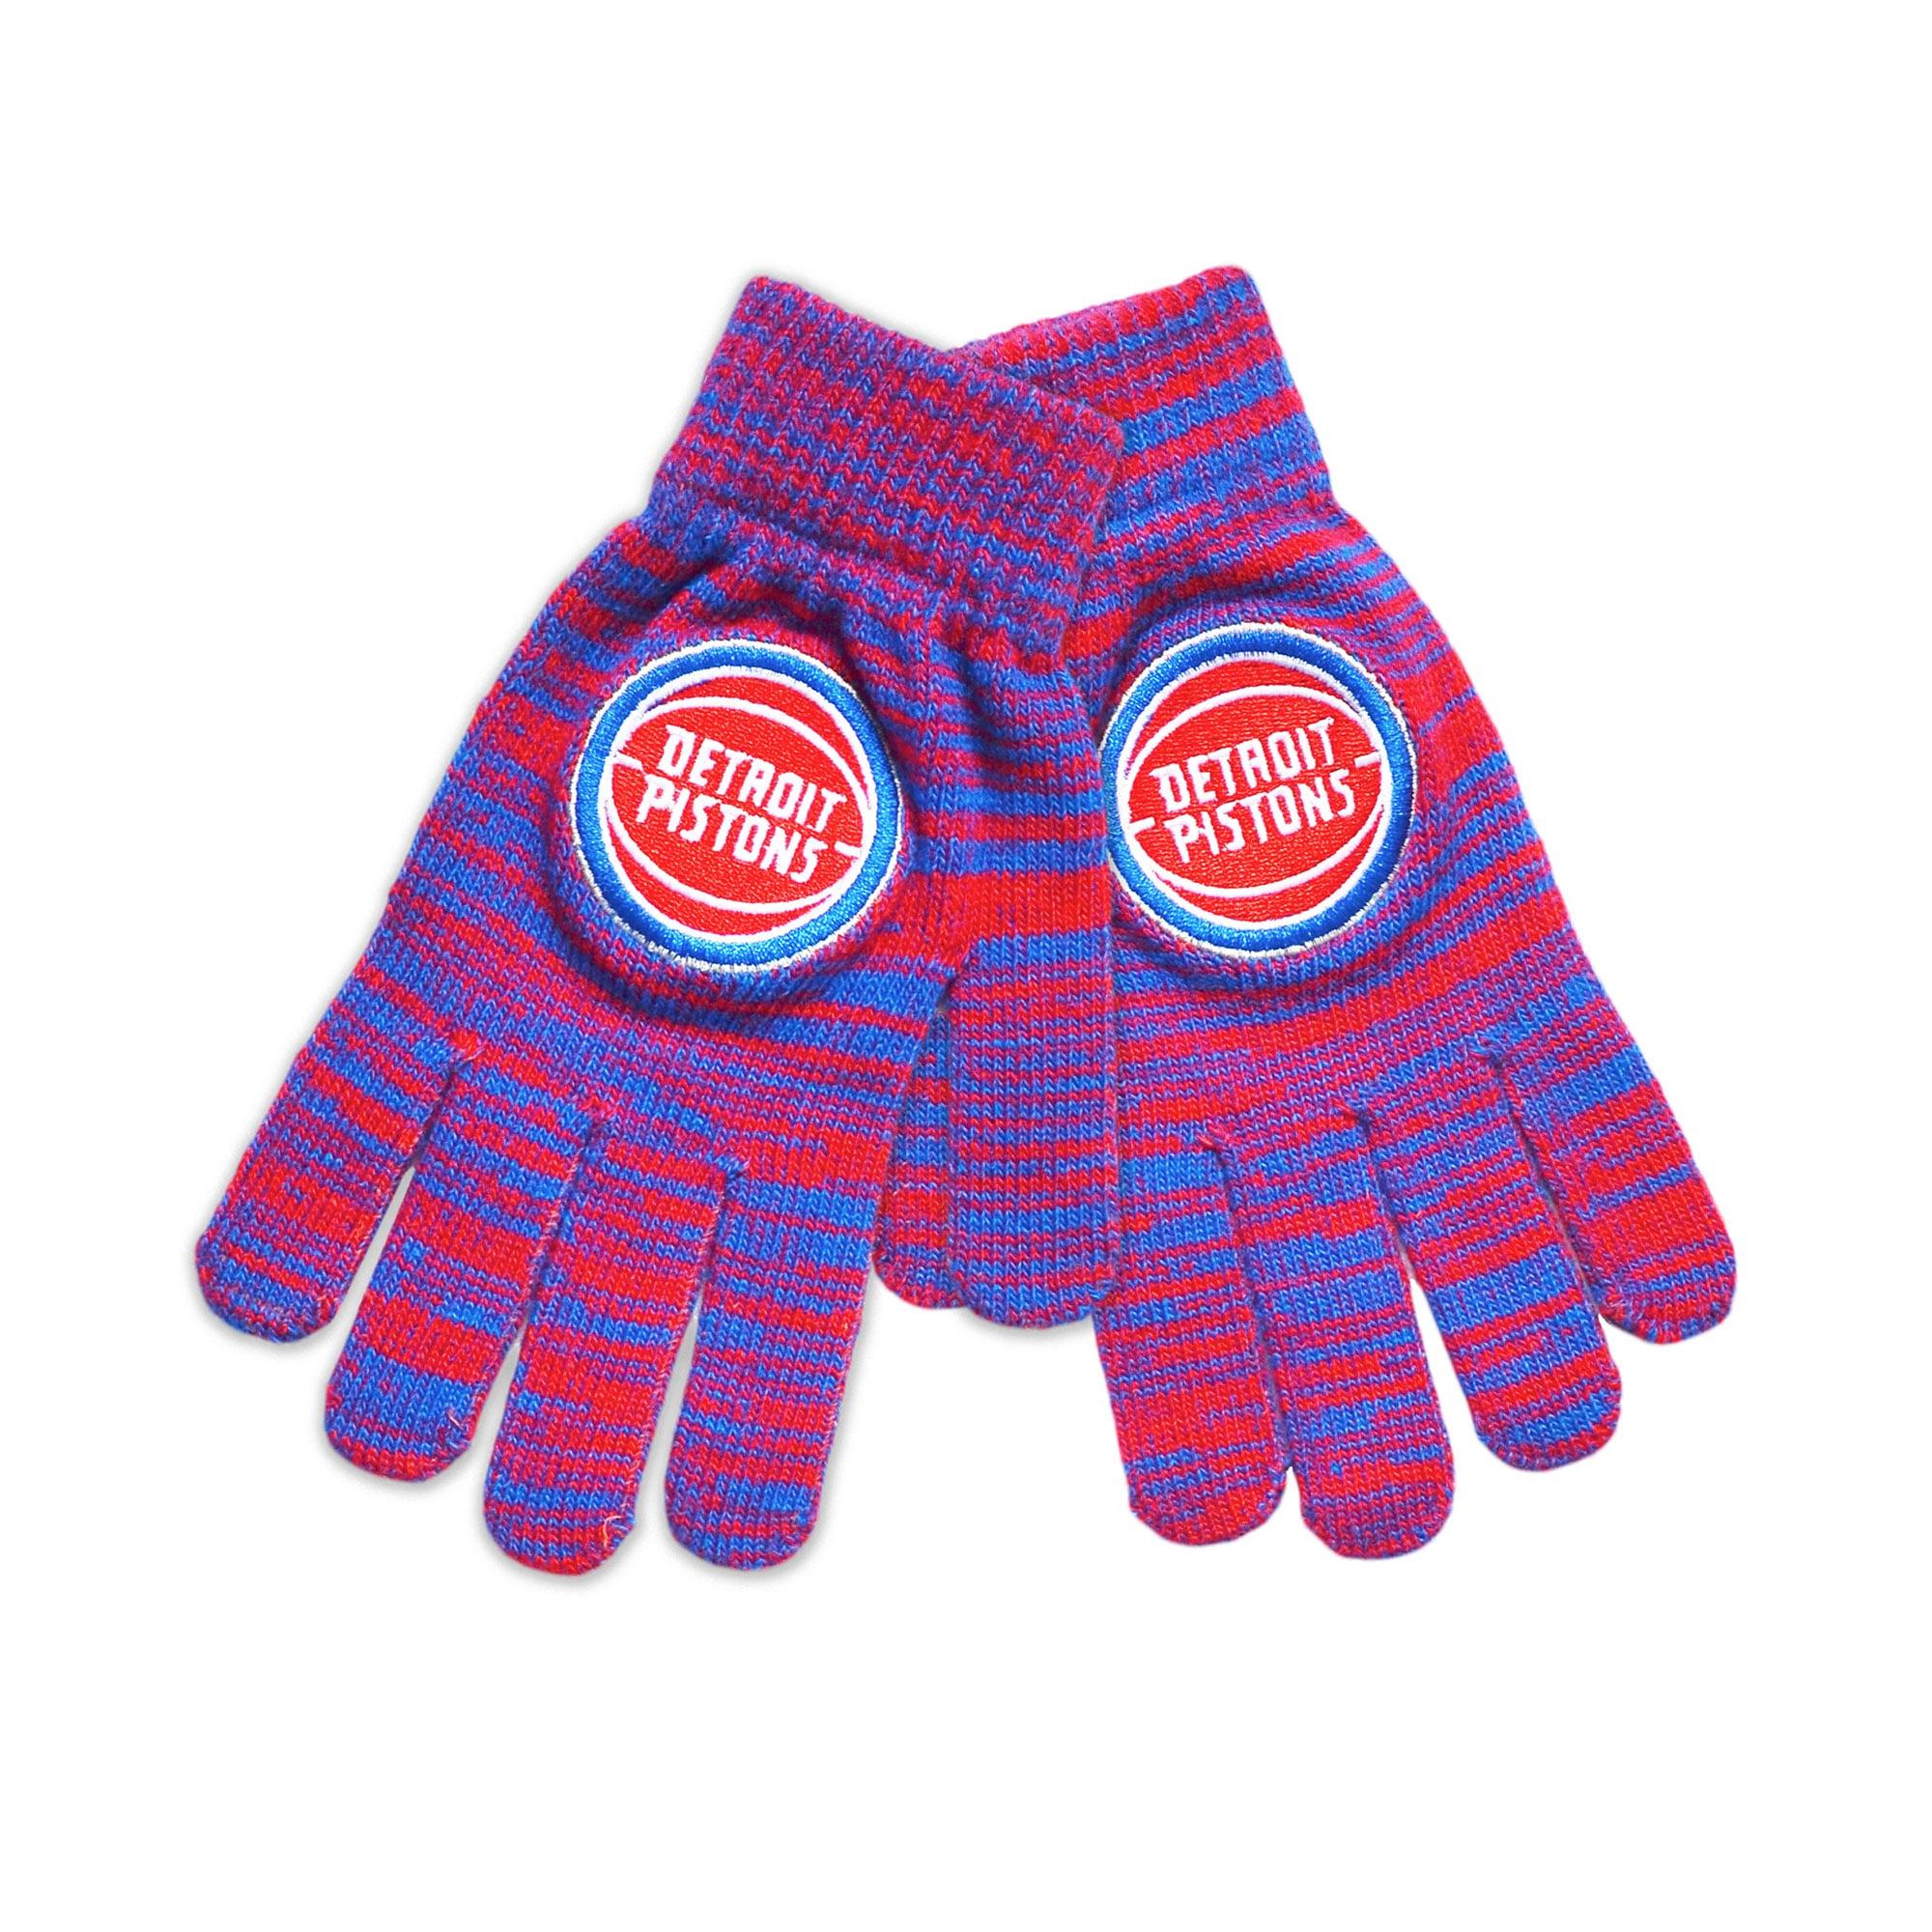 Detroit Pistons Colorblend Gloves